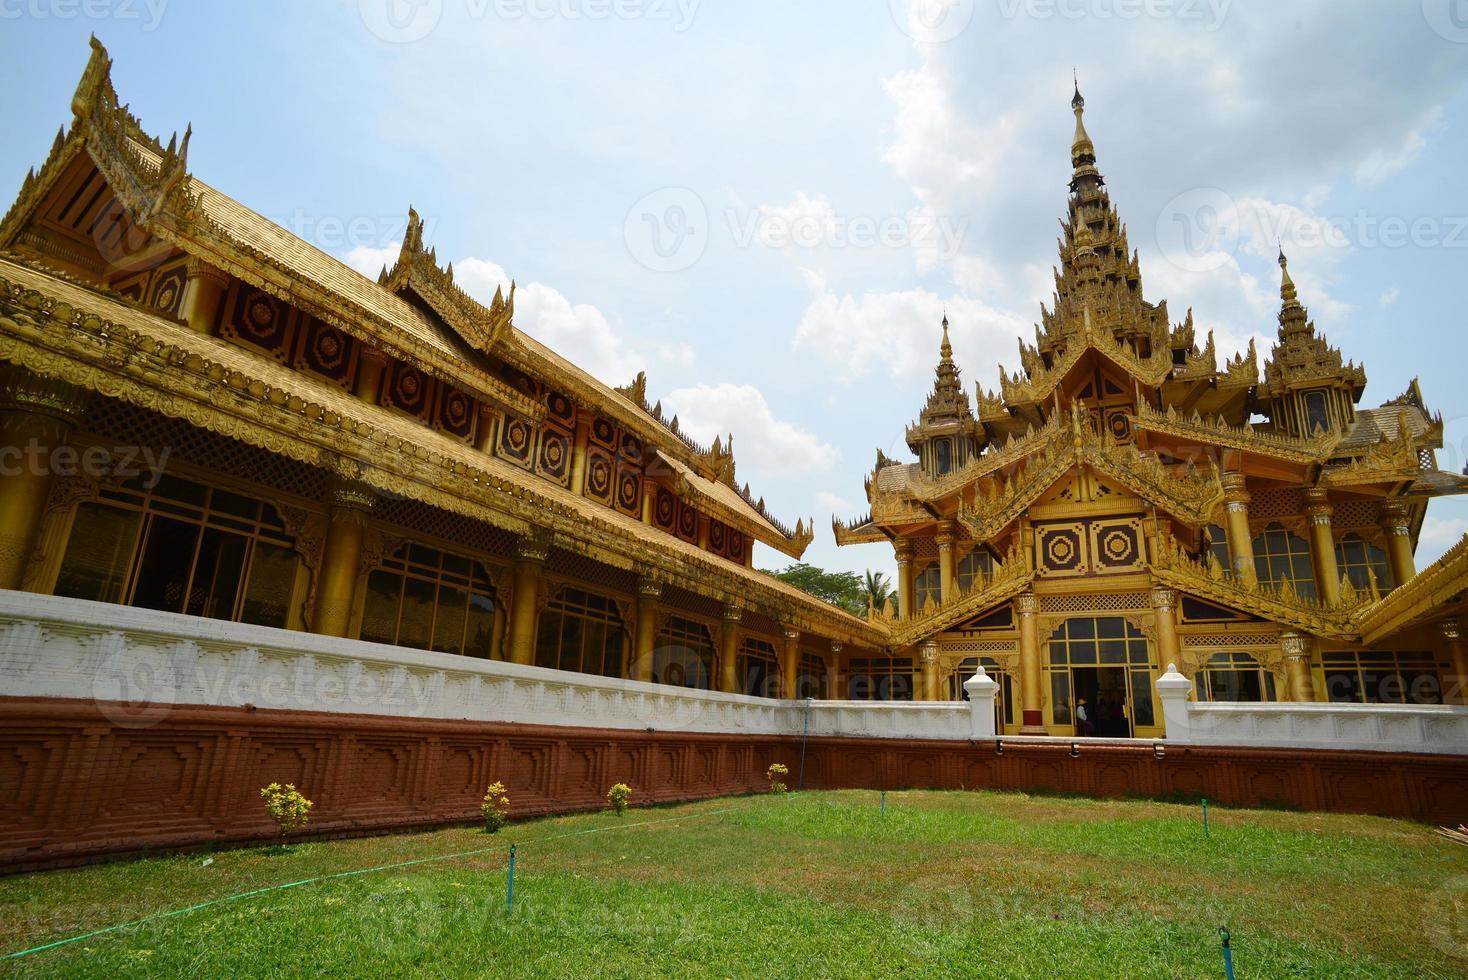 palácio dourado de kambawzathardi (palácio de bayinnaung) em bago, mya foto